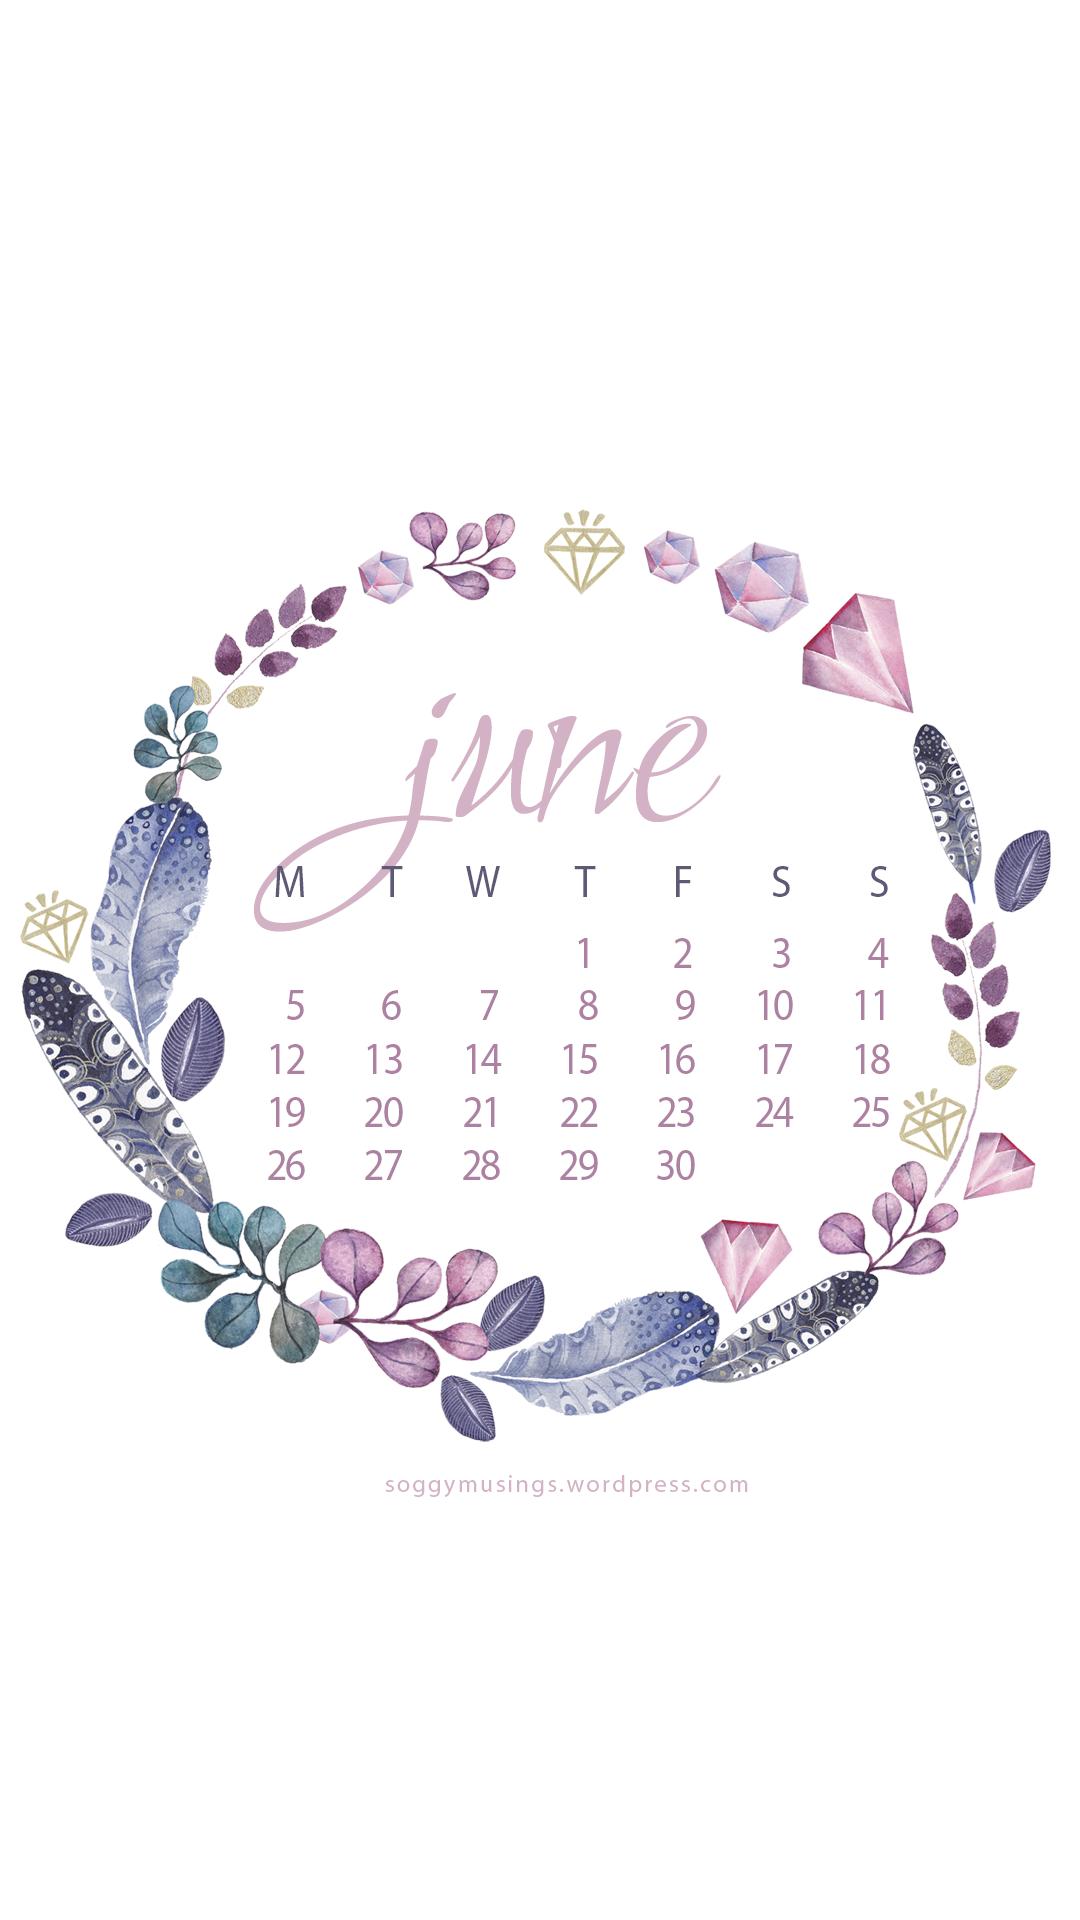 Calendar Background June : June wallpaper calendars soggy musings